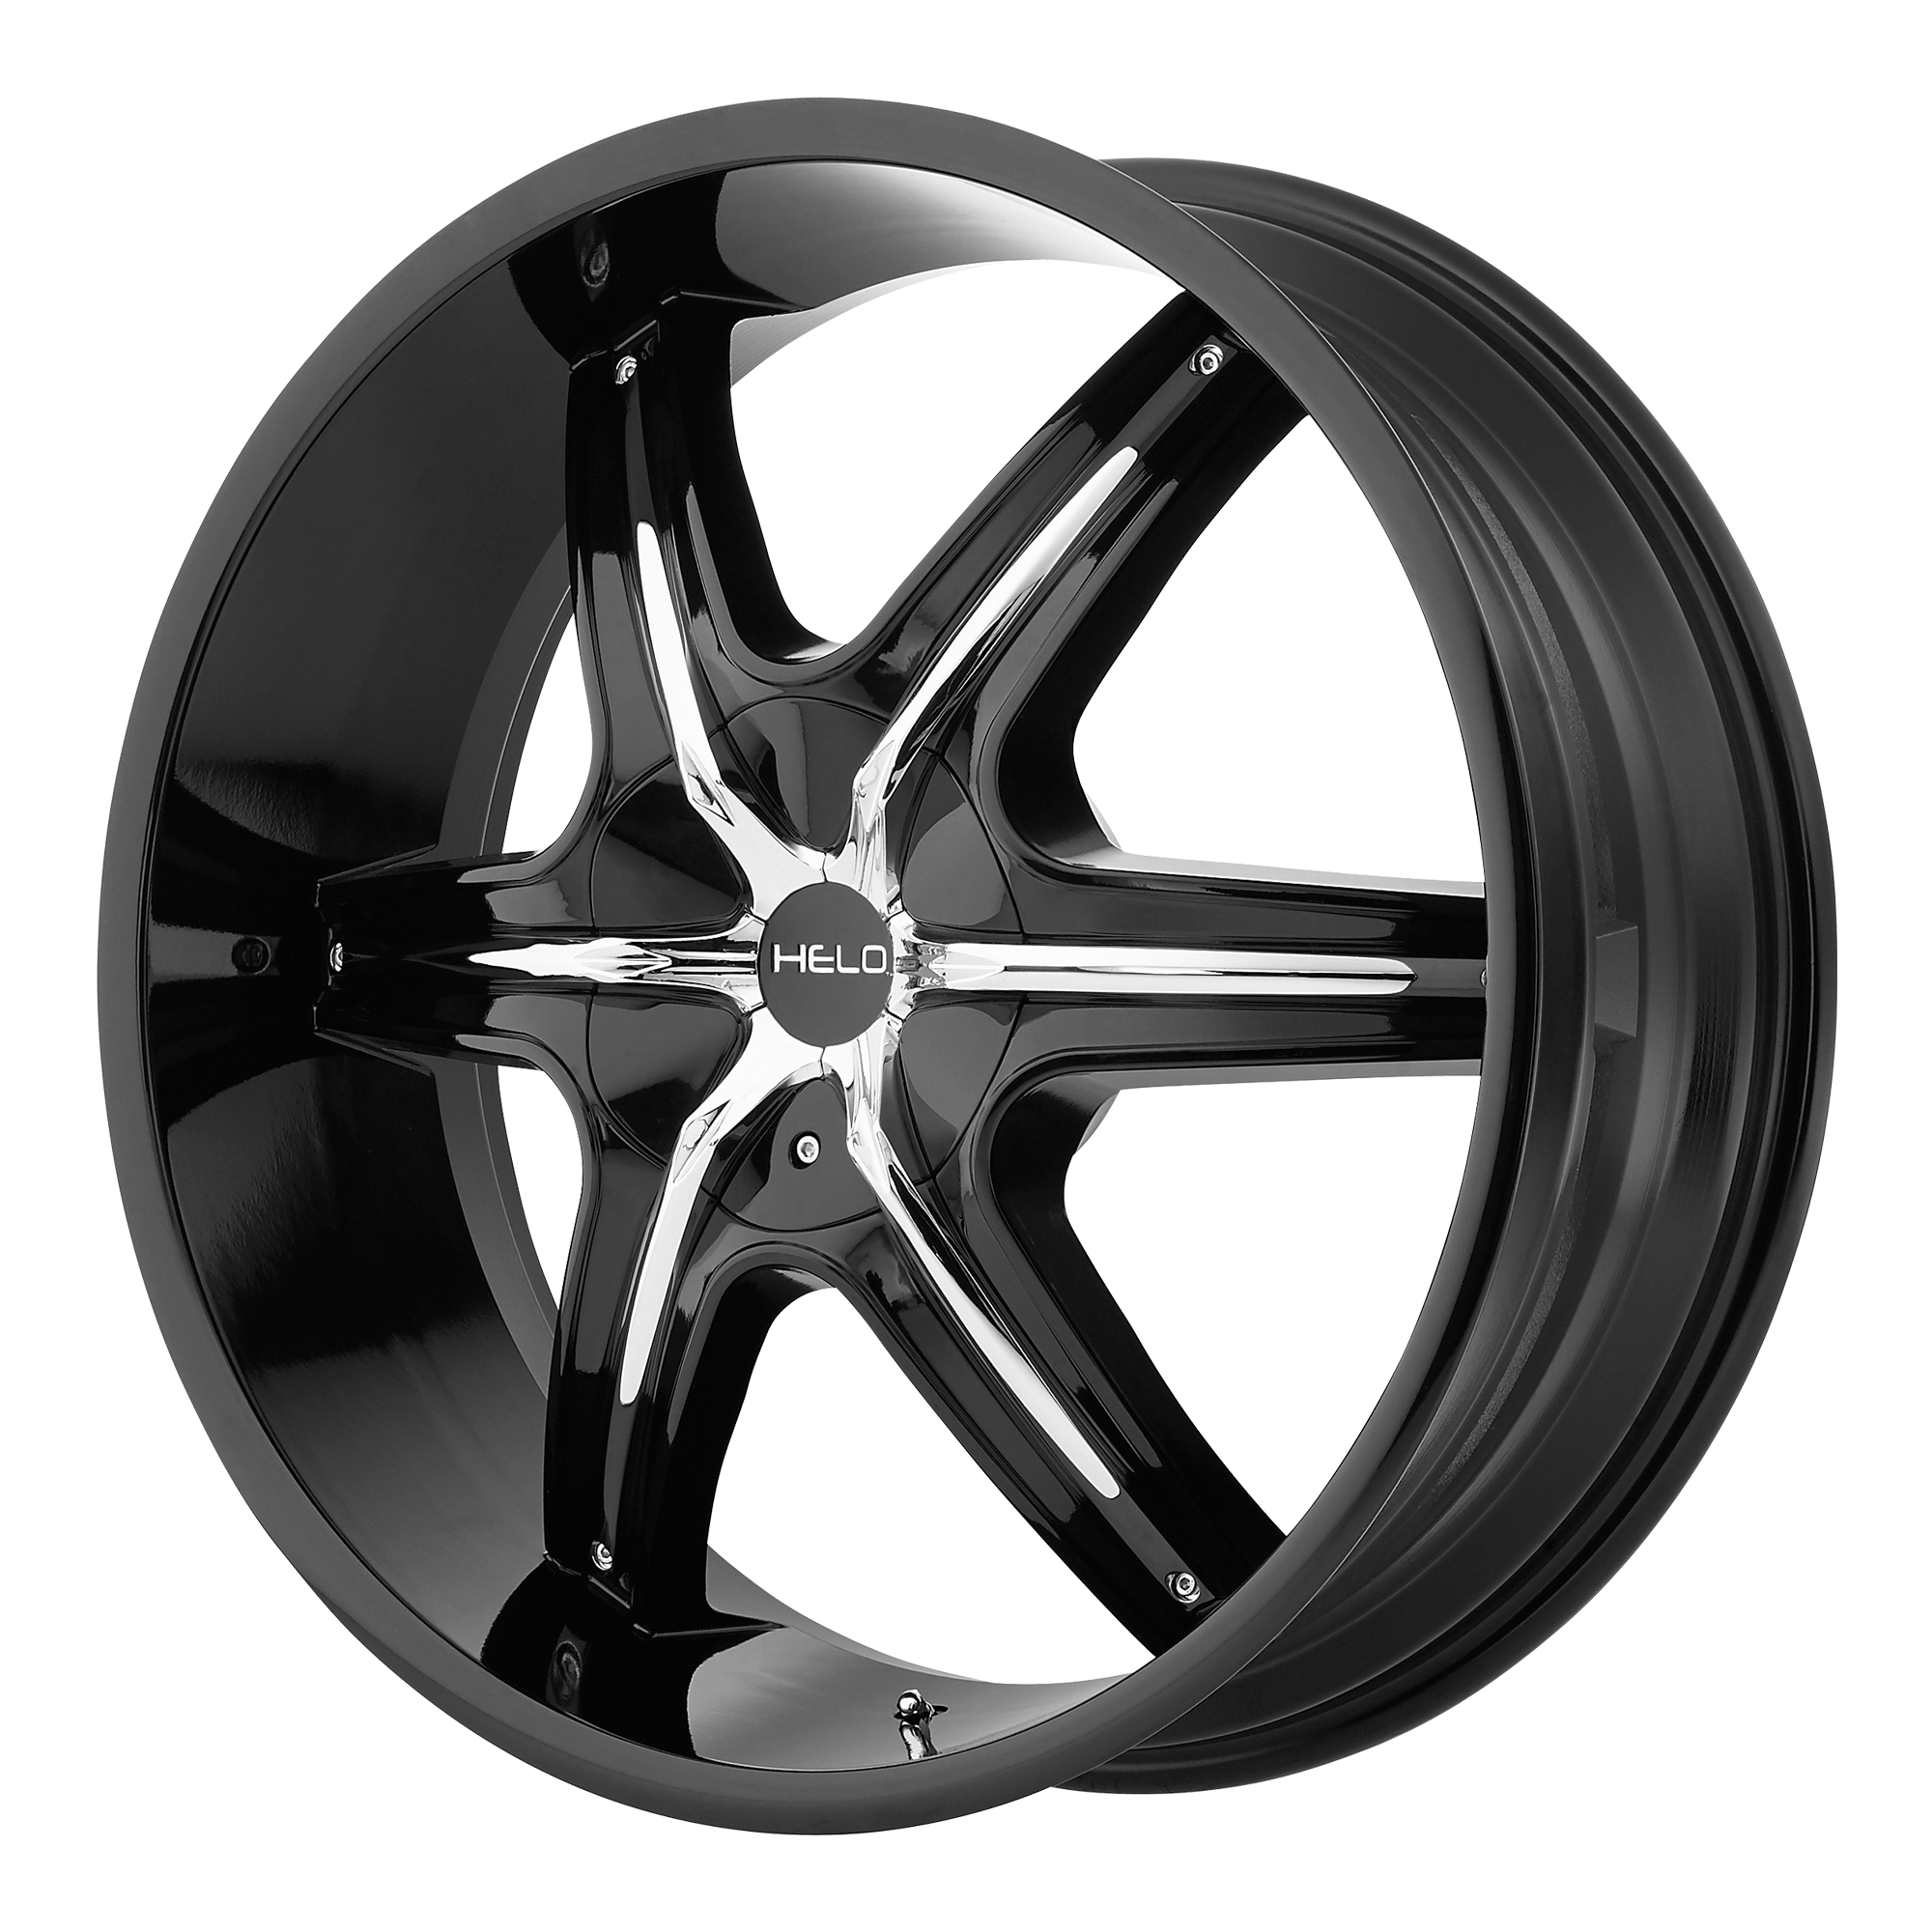 Helo Wheels HE891 Gloss Black w/ Gloss Black and Chrome Accents